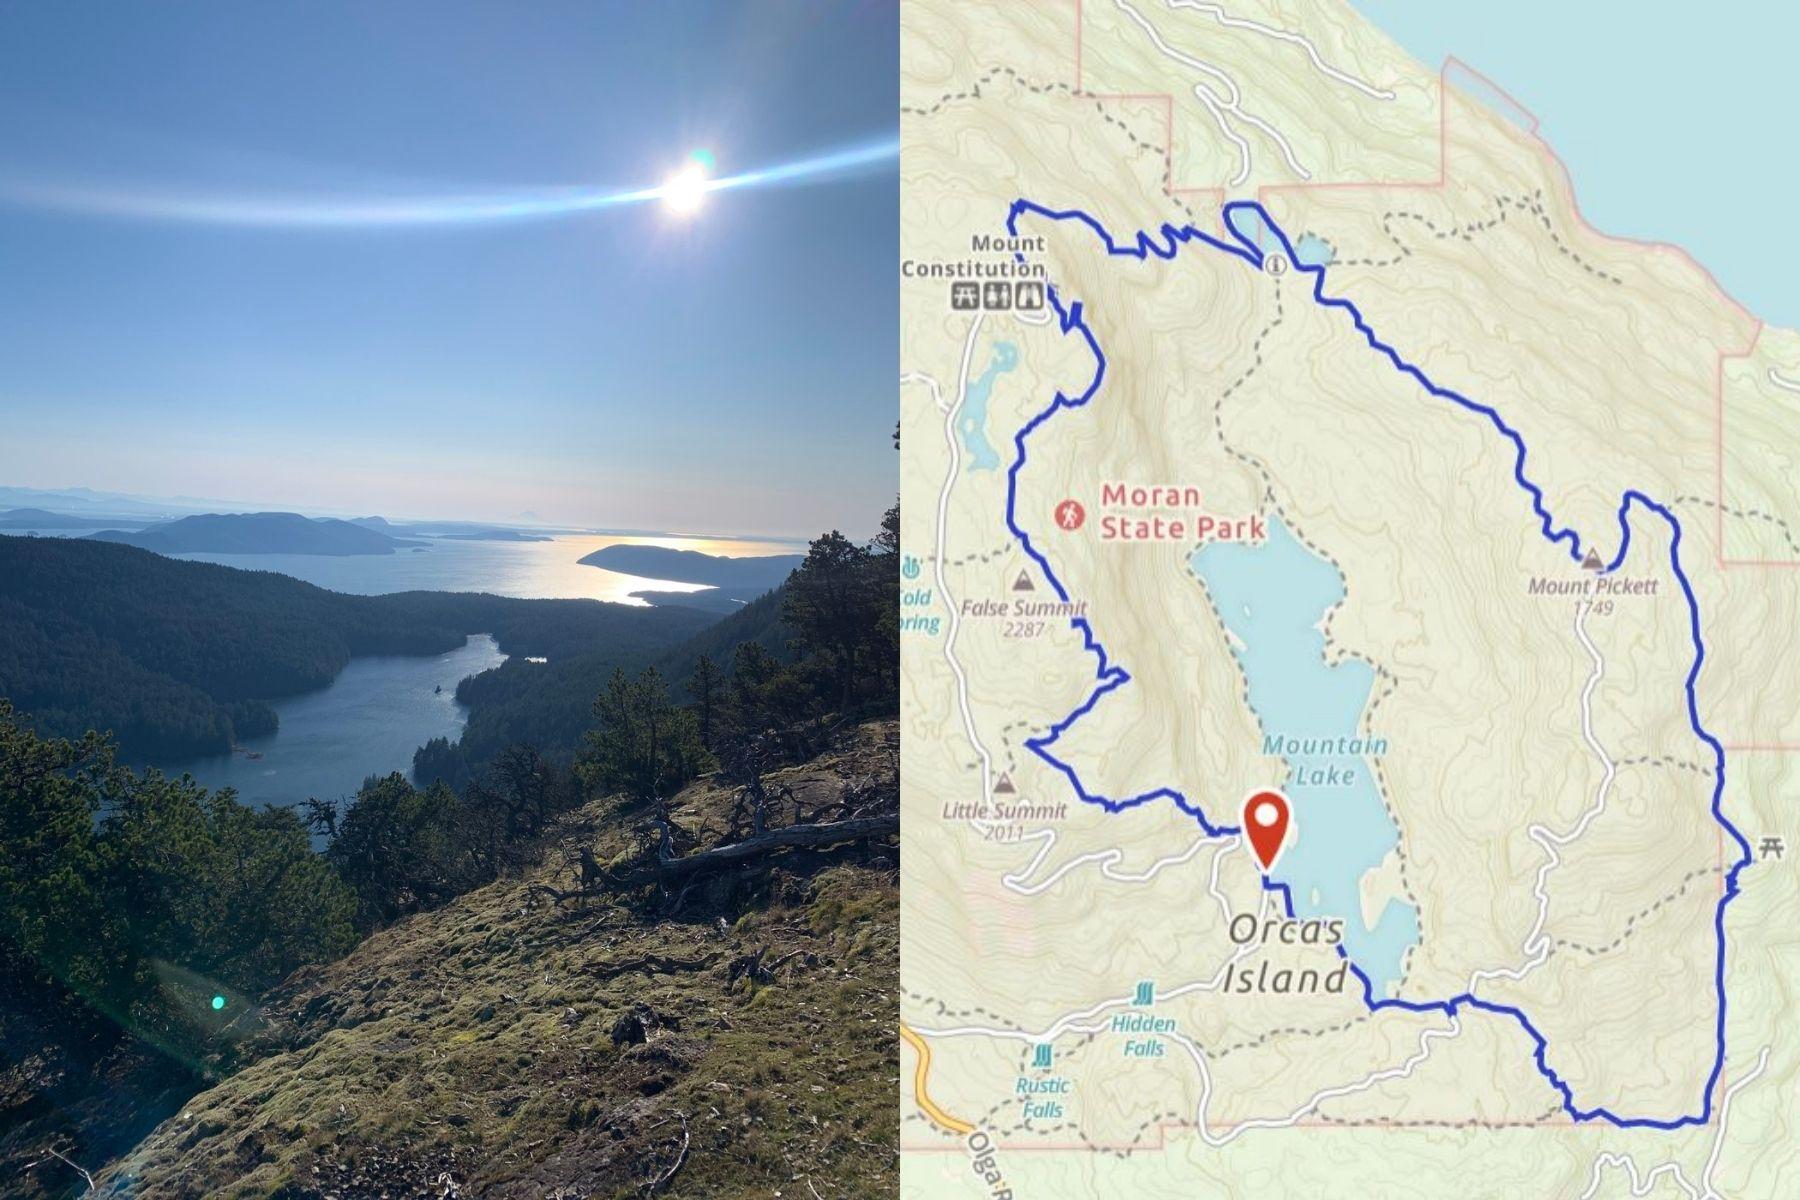 Mount Constitution via Mountain Lake + Twin Lakes and Mount Pickett